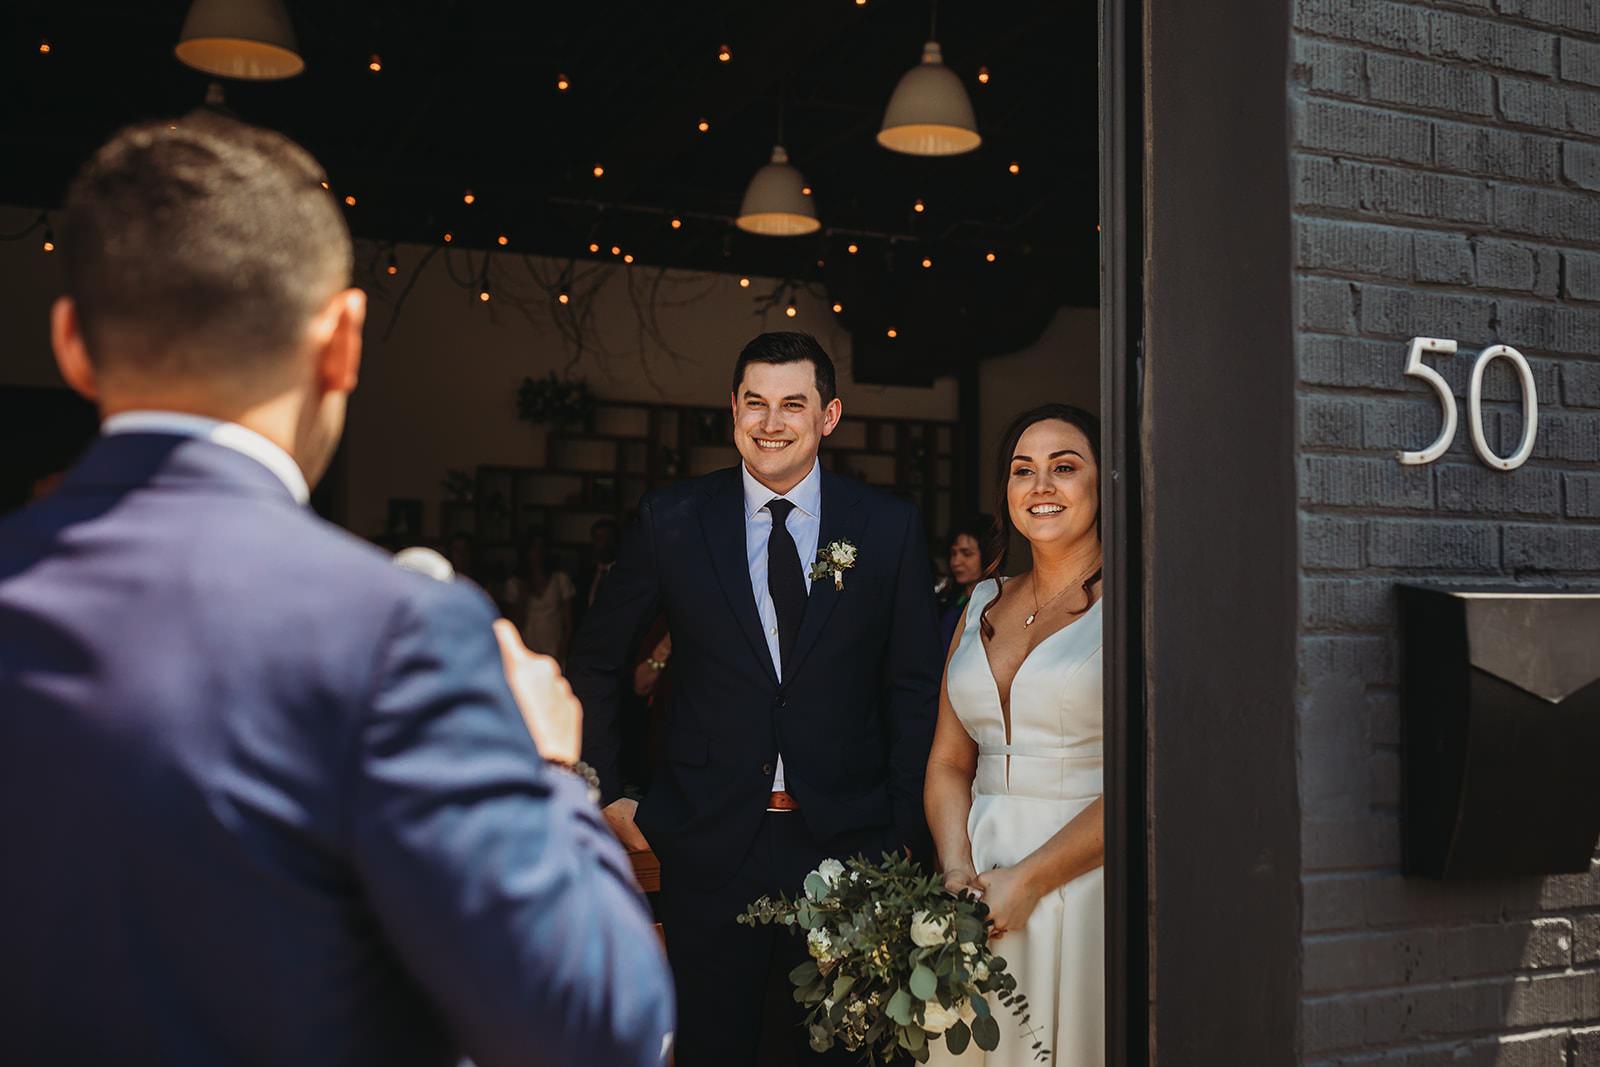 small wedding venues in toronto, intimate wedding venues, propeller coffee co